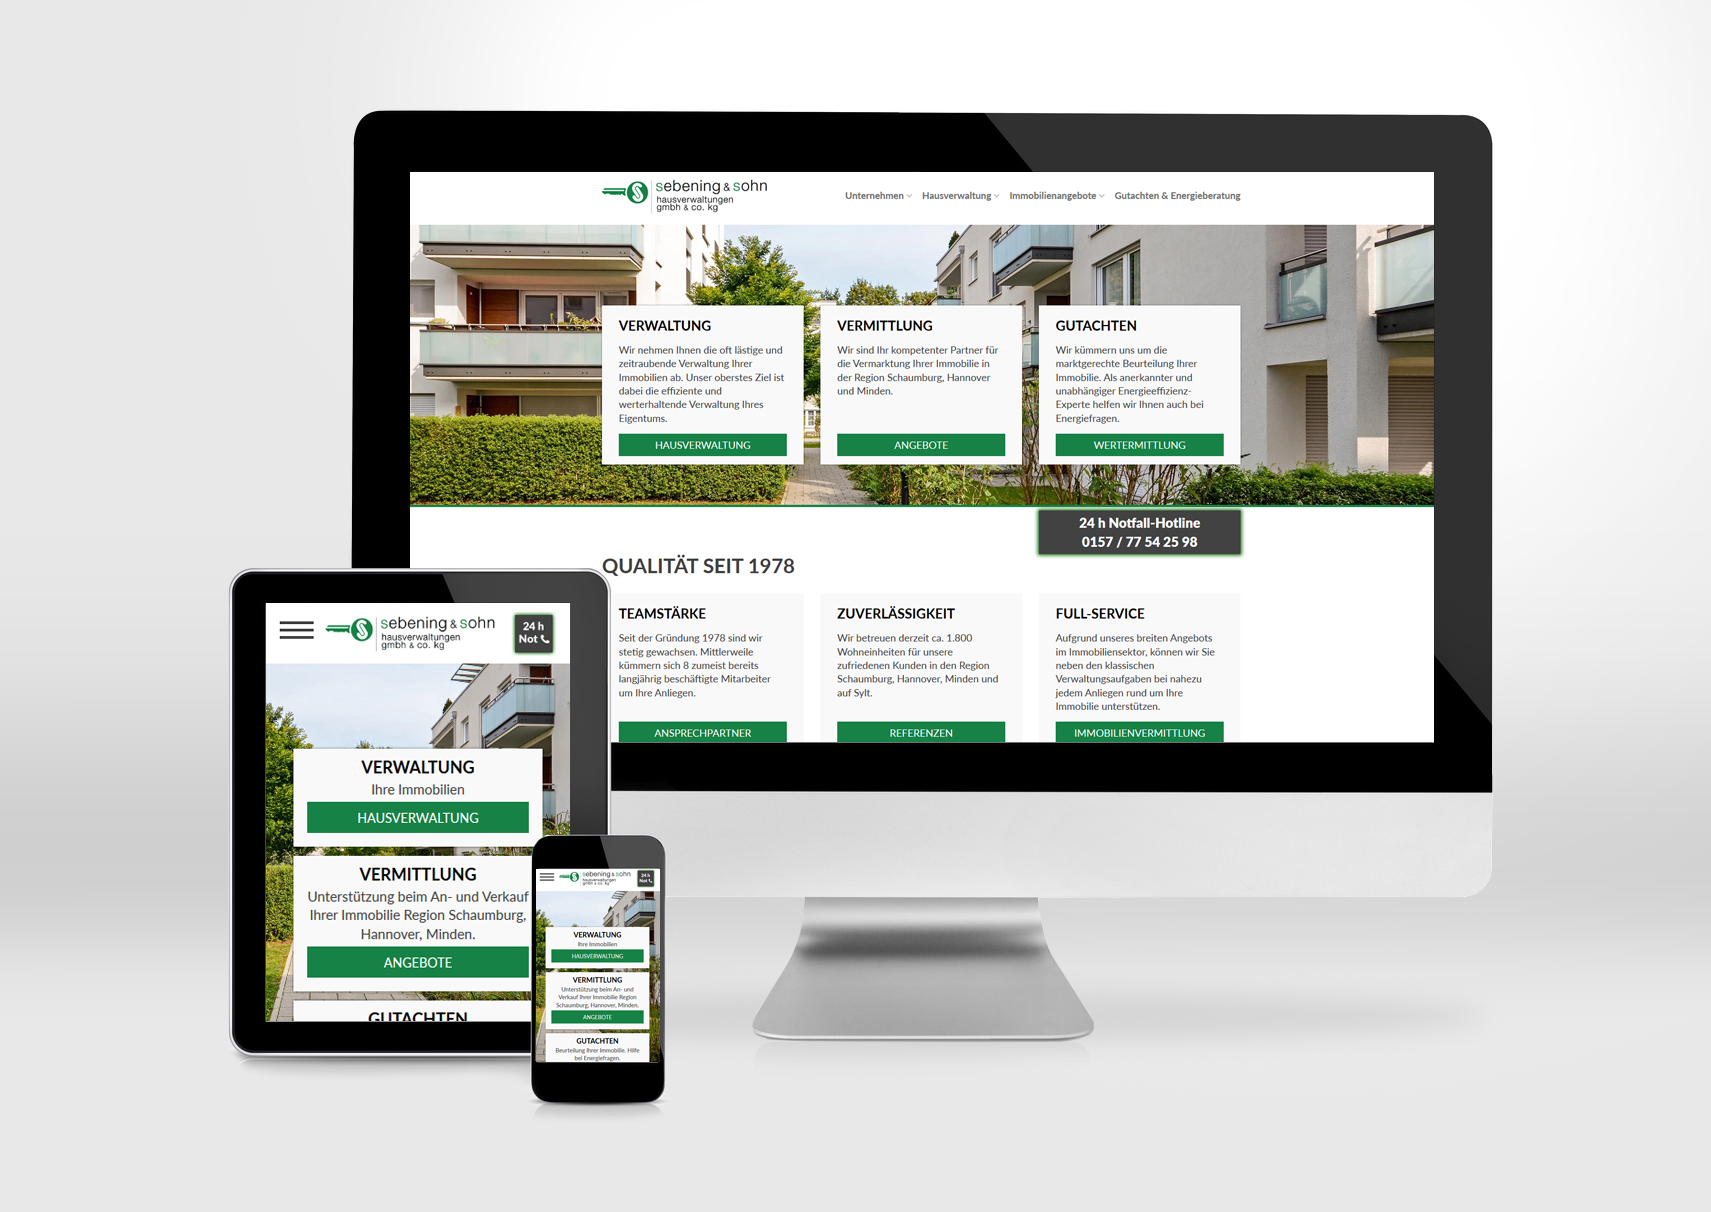 sebening sohn hausverwaltungen gmbh co kg medien 31 hameln internetseiten apps. Black Bedroom Furniture Sets. Home Design Ideas